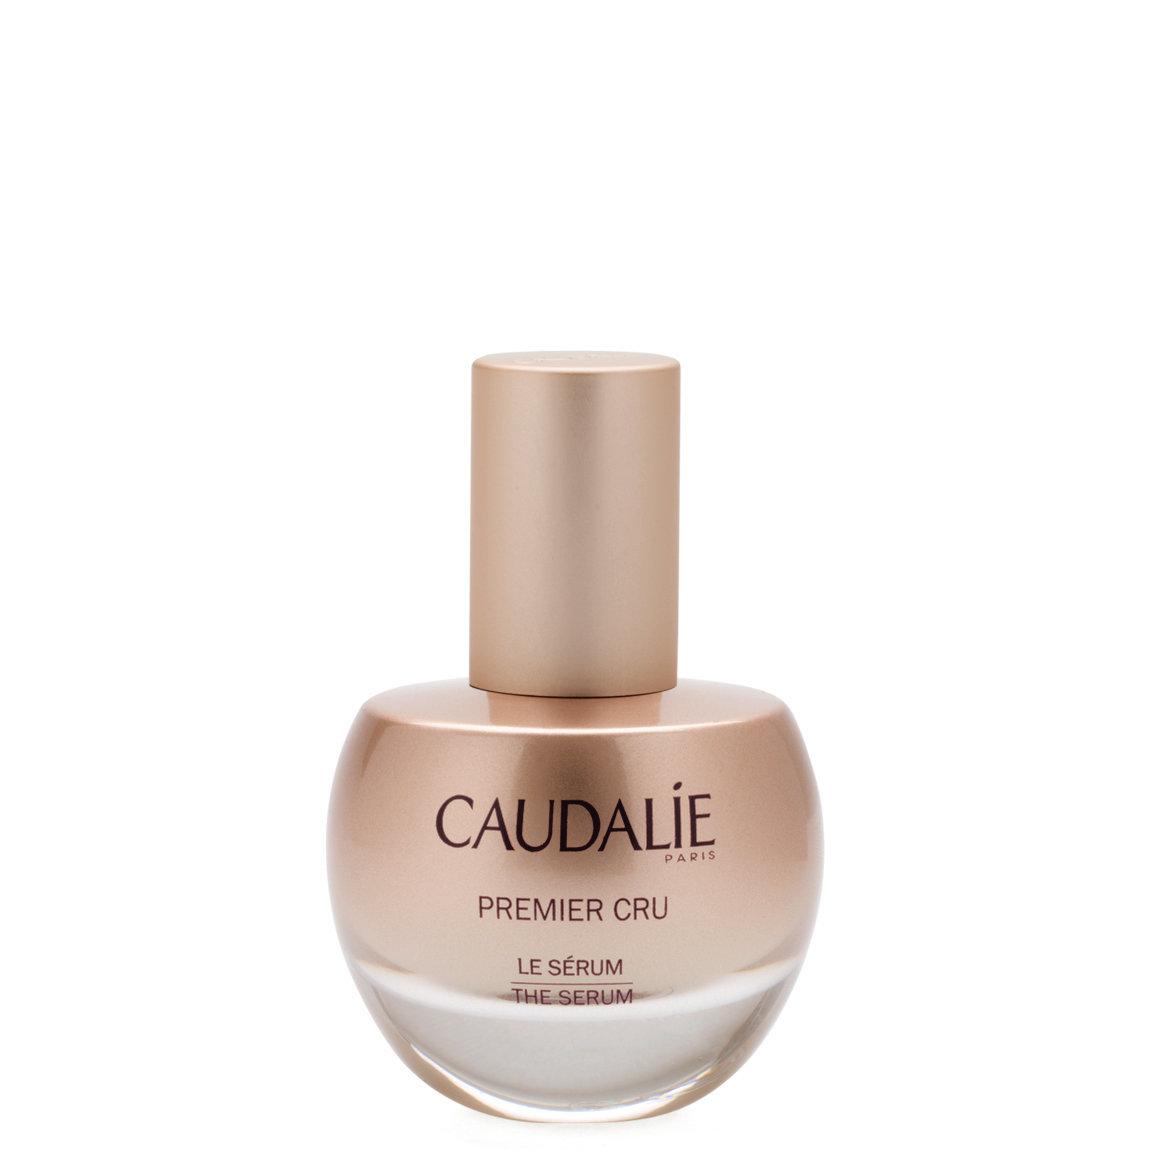 Caudalie Premier Cru The Serum alternative view 1 - product swatch.